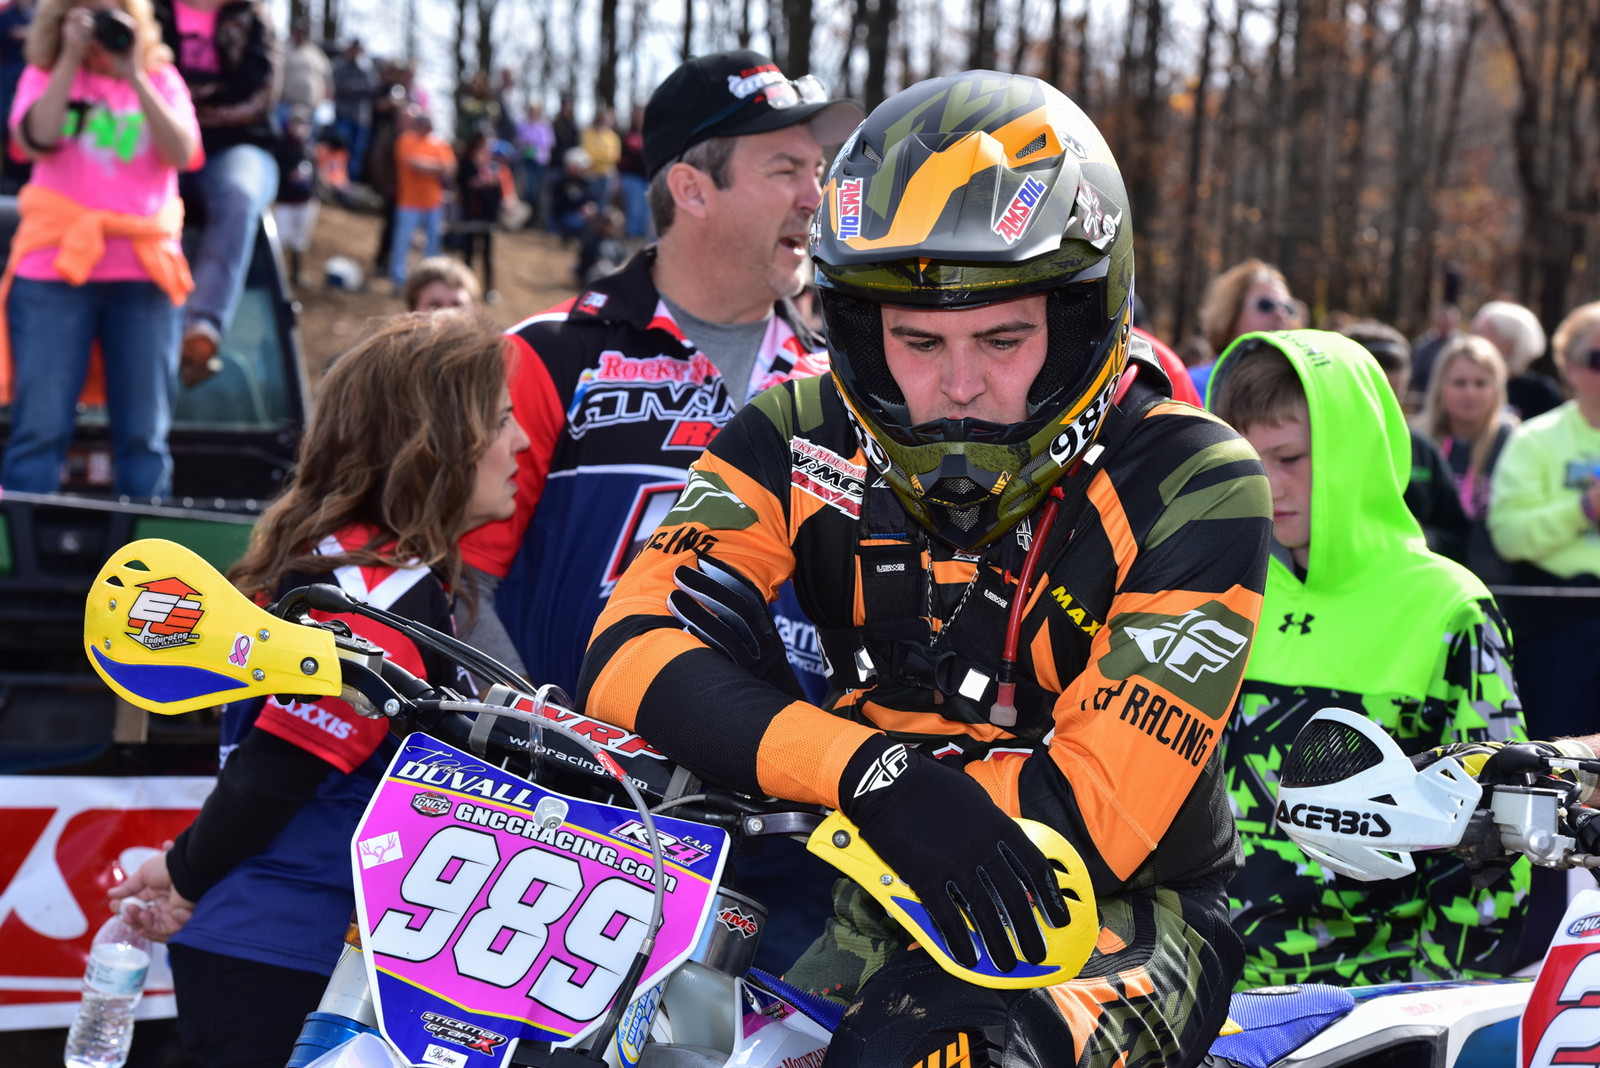 Thad Duvall - Photo Blast: Ironman GNCC - Motocross Pictures - Vital MX